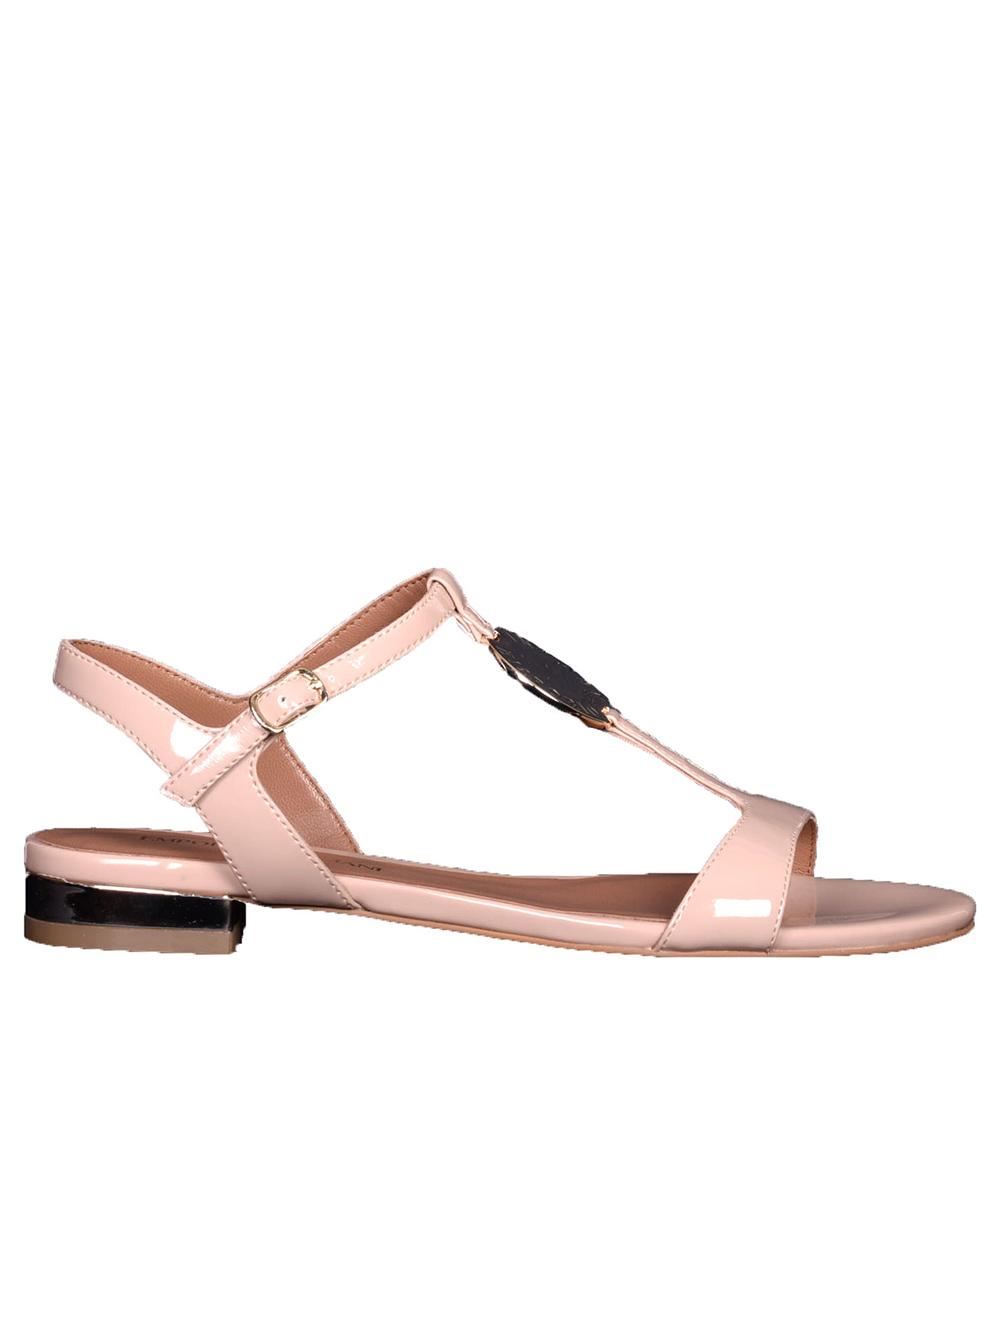 EMPORIO ARMANI Παπούτσια σανδάλια X3P640 XL846 ΜΠΕΖ